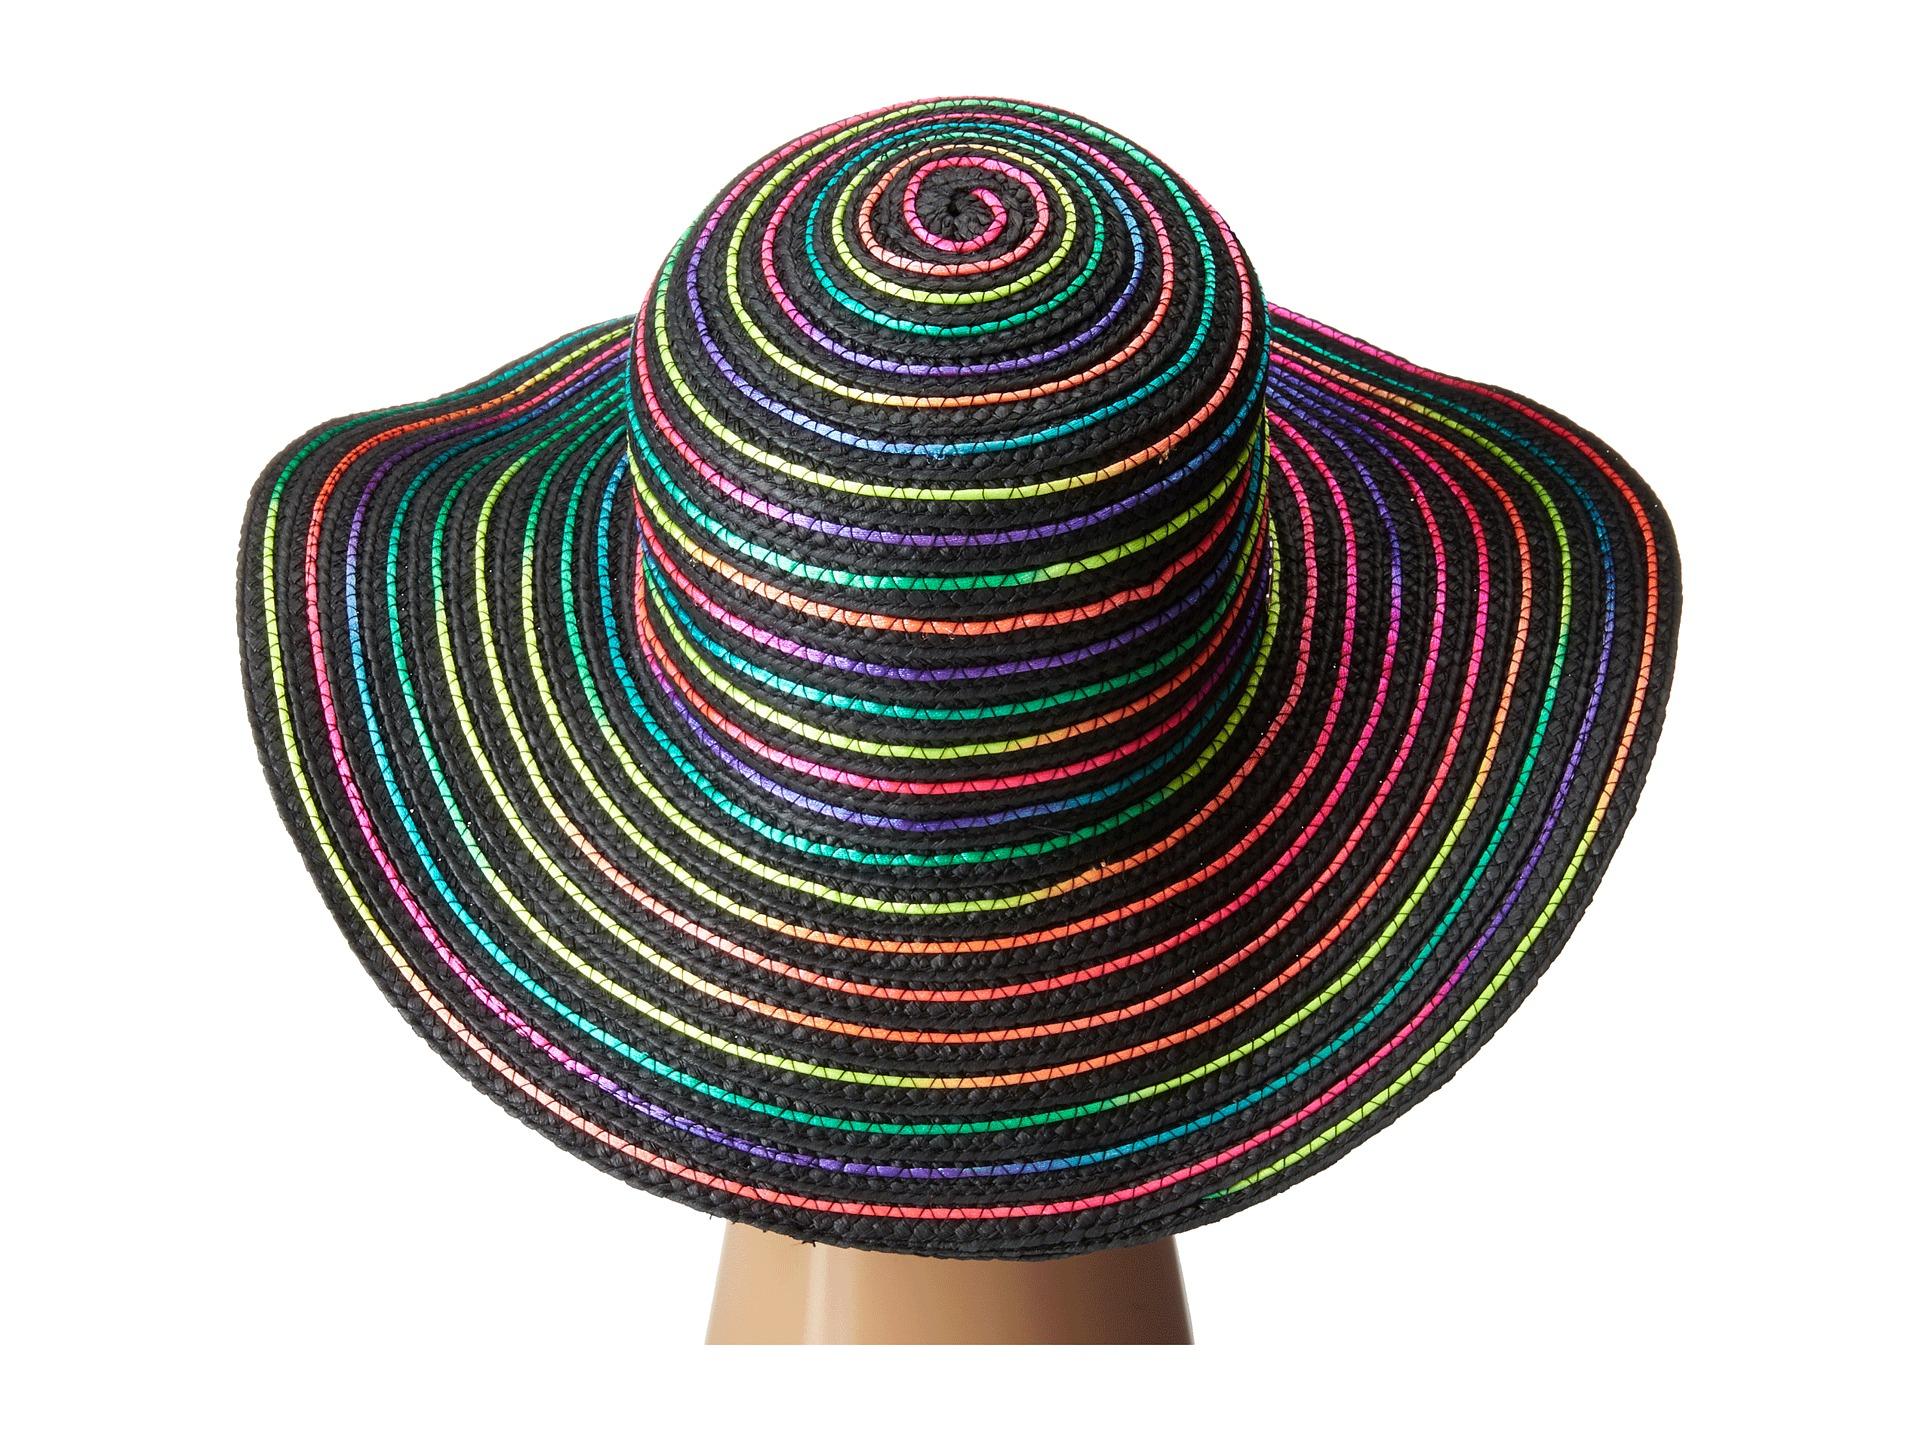 Lyst - Betsey Johnson Rainbow Swirl Floppy Hat in Gray 11c825086a0